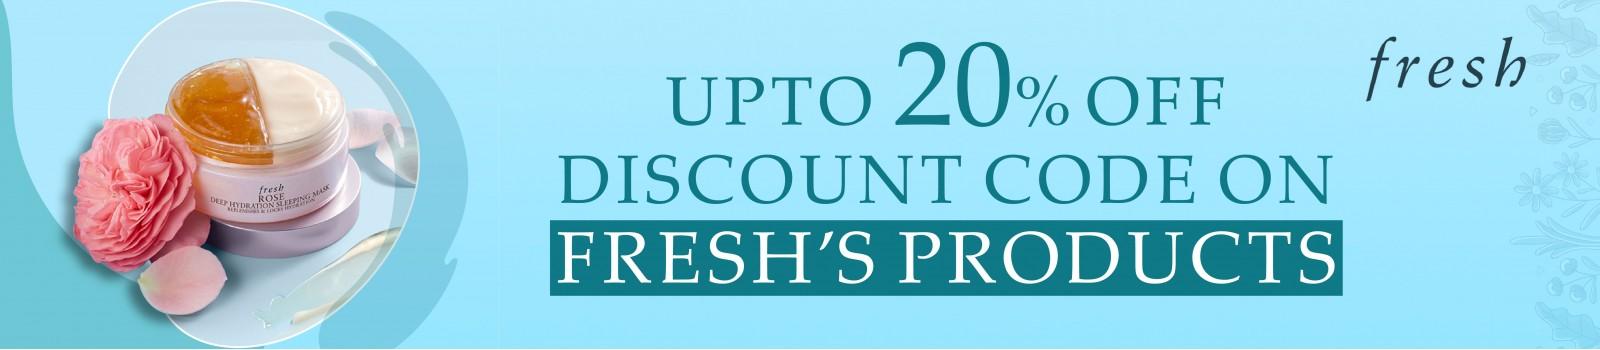 fresh-coupon-code